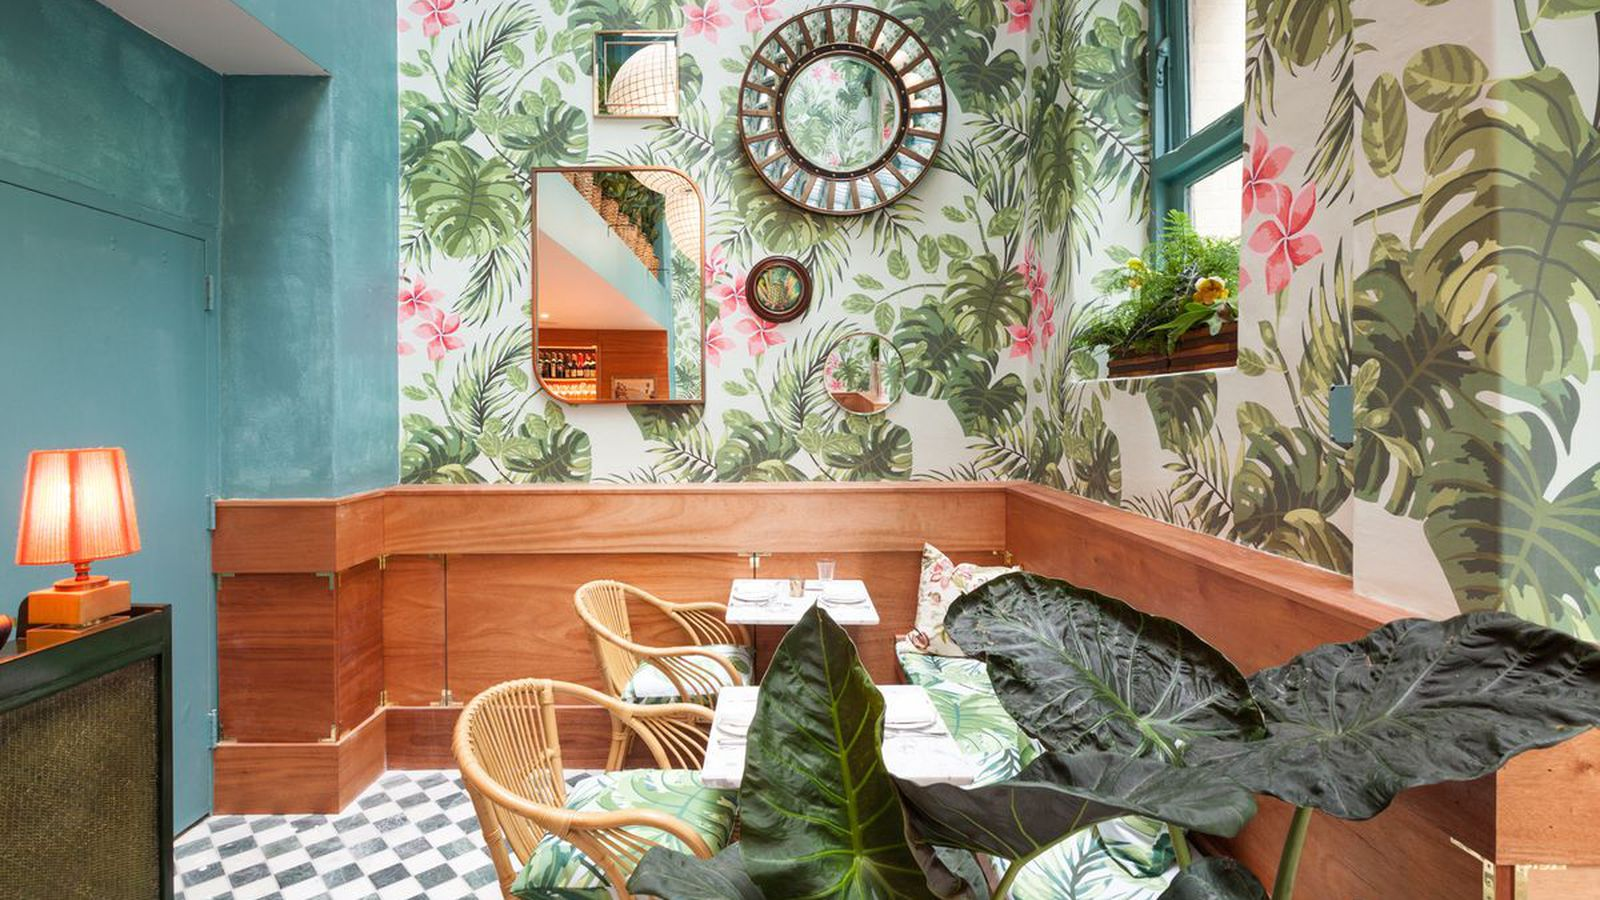 Restaurant Oyster Bar Hospitality Interior Design Of Elliott S Oyster House Seattle : Interior design star ken fulk nabs prestigious food award